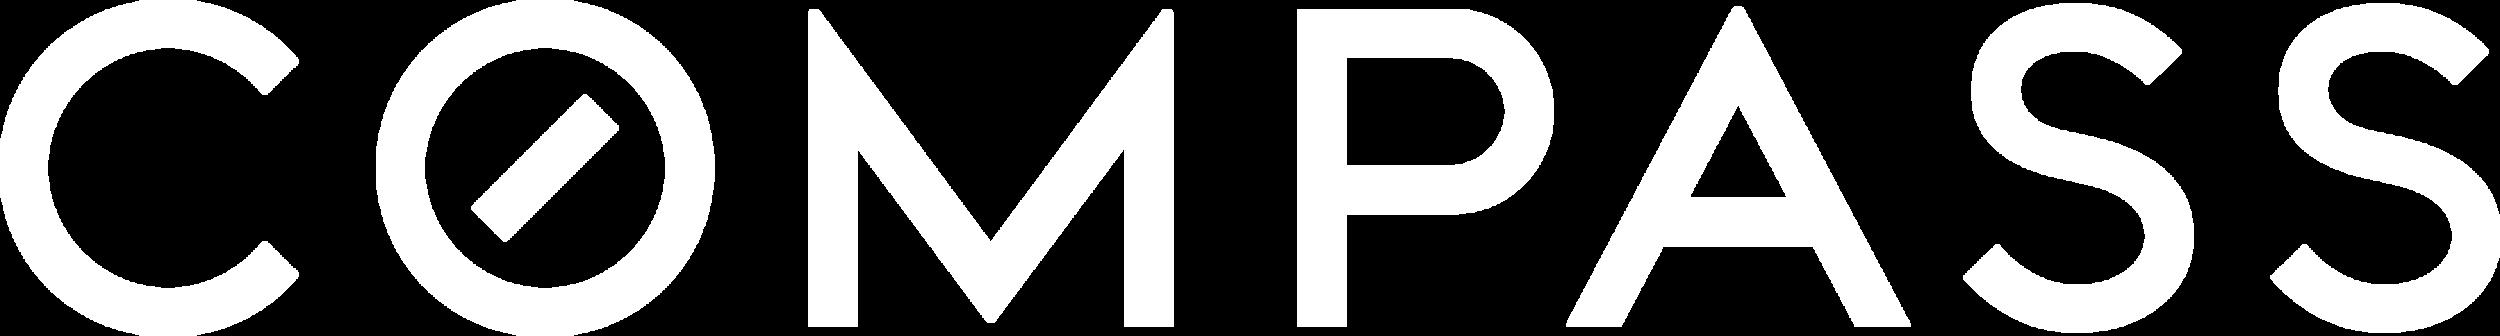 Compass_Logo_H_W_transparent-background.png